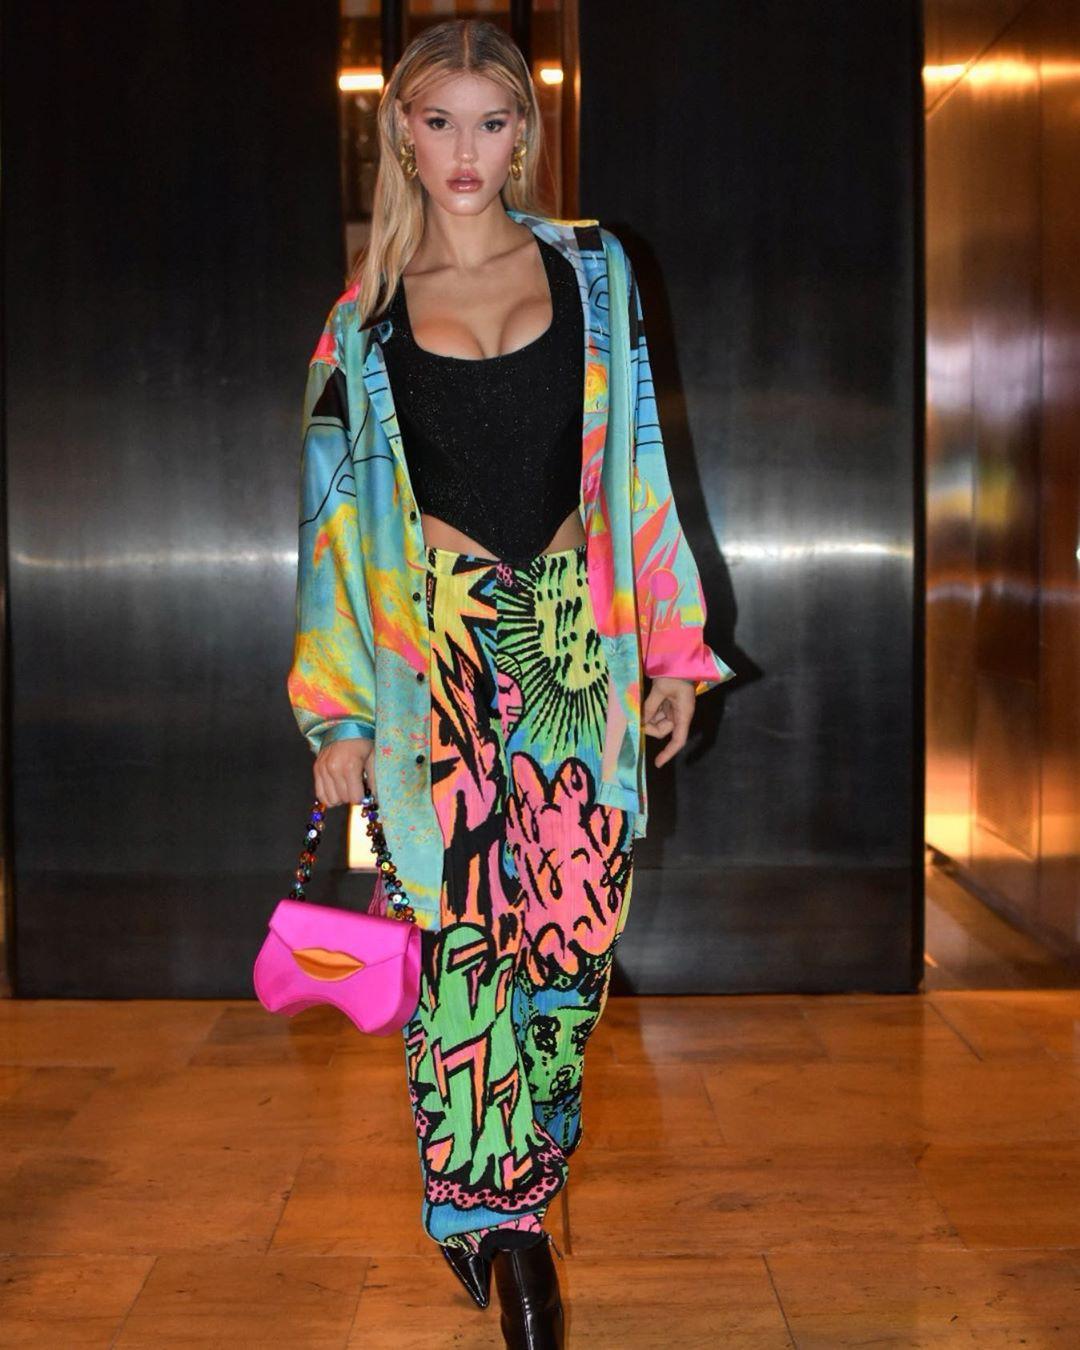 Joy Corrigan dress trousers outfits for women, apparel ideas